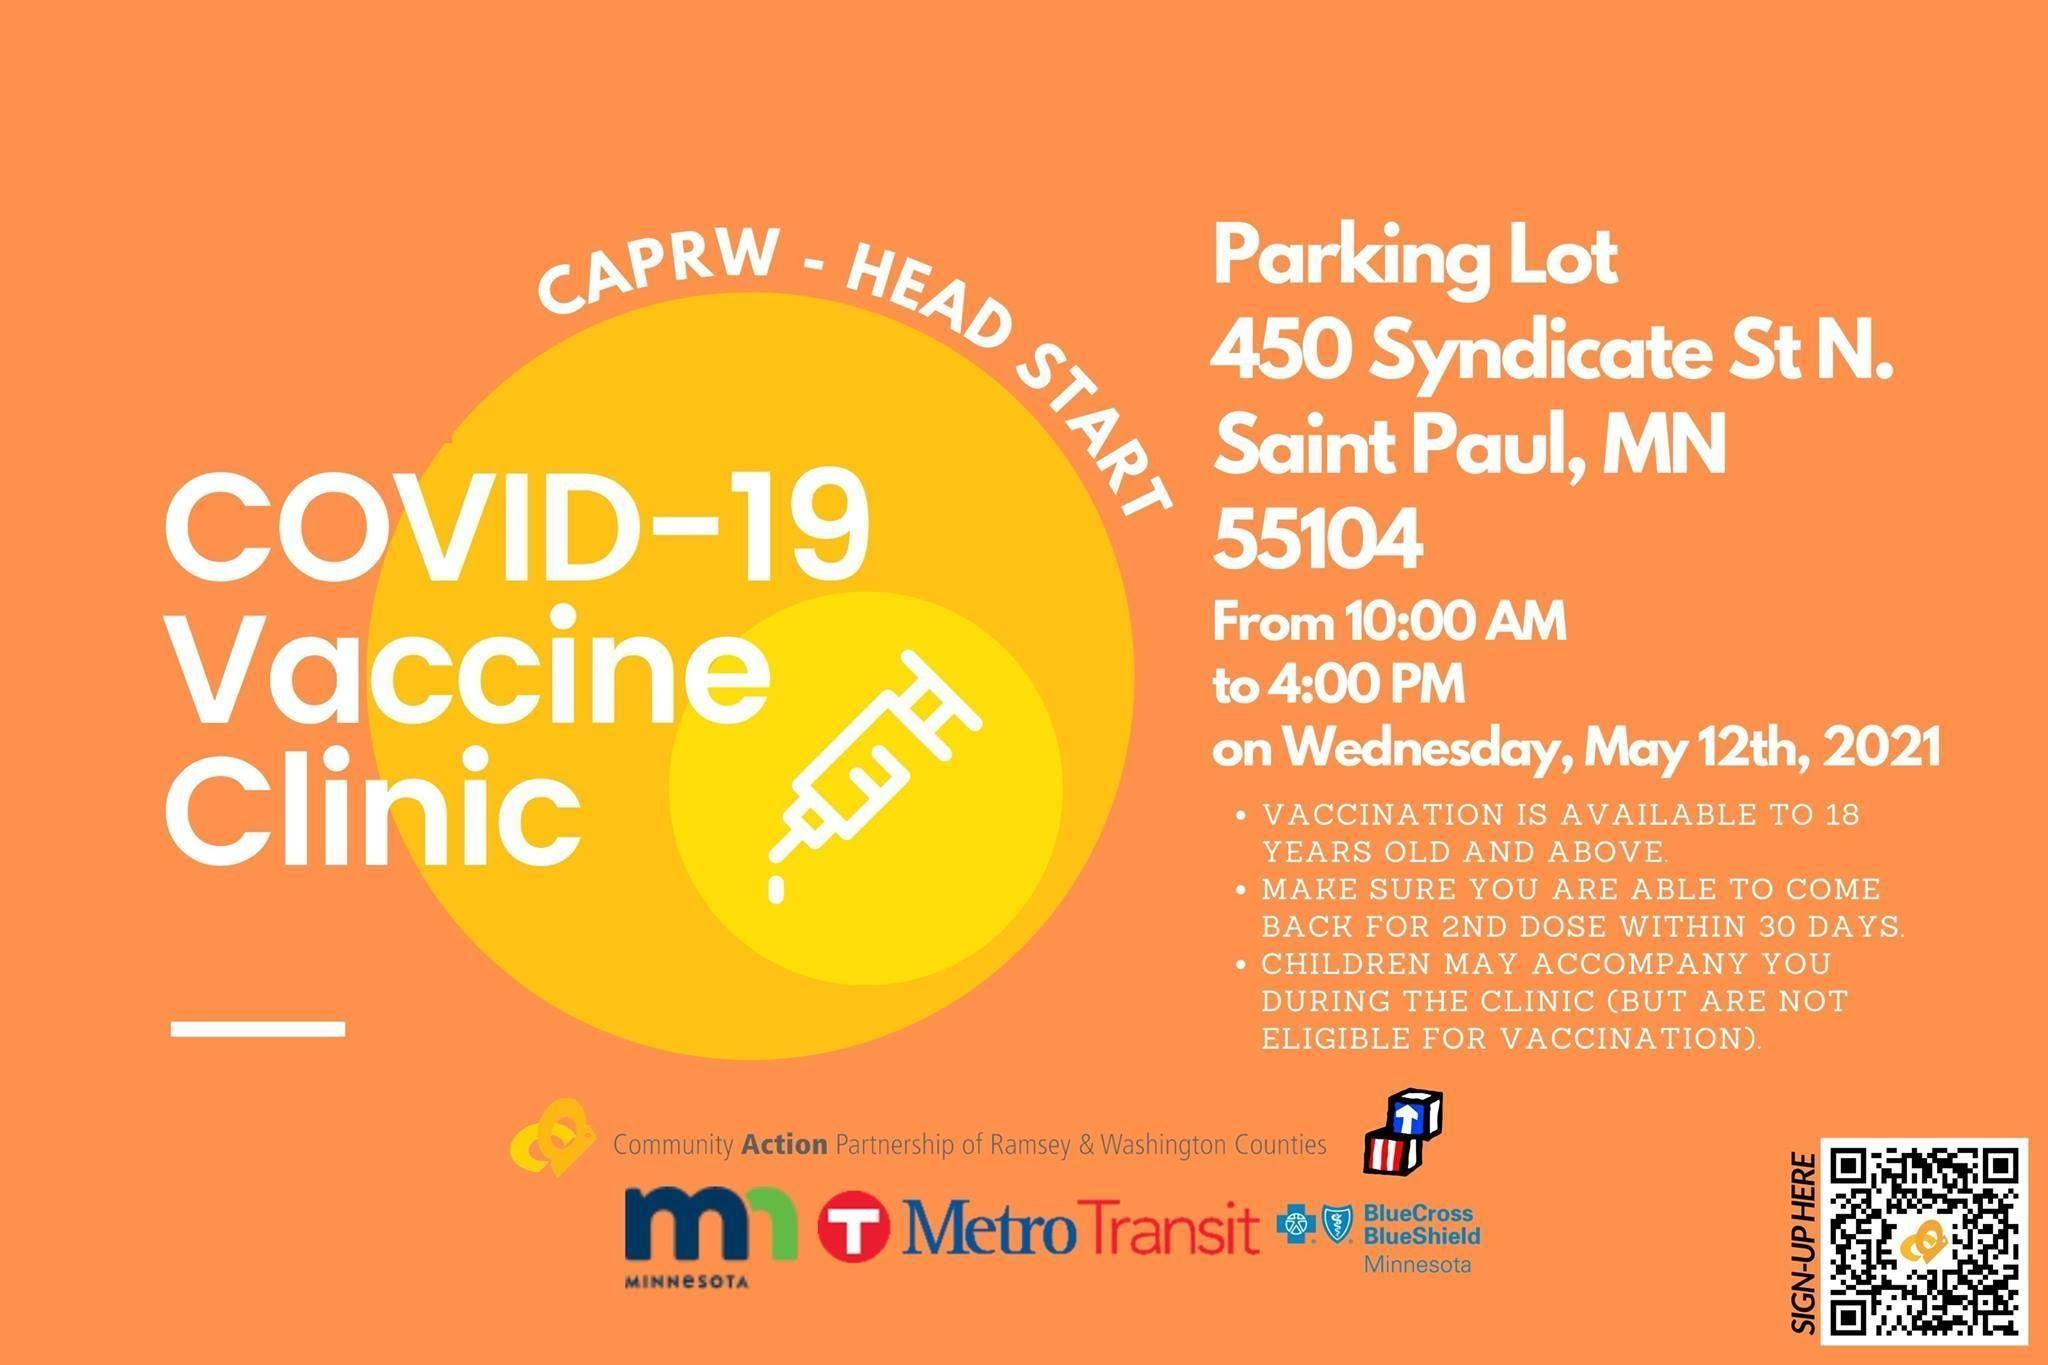 CAPRW Head Start to Host Vaccine Clinic